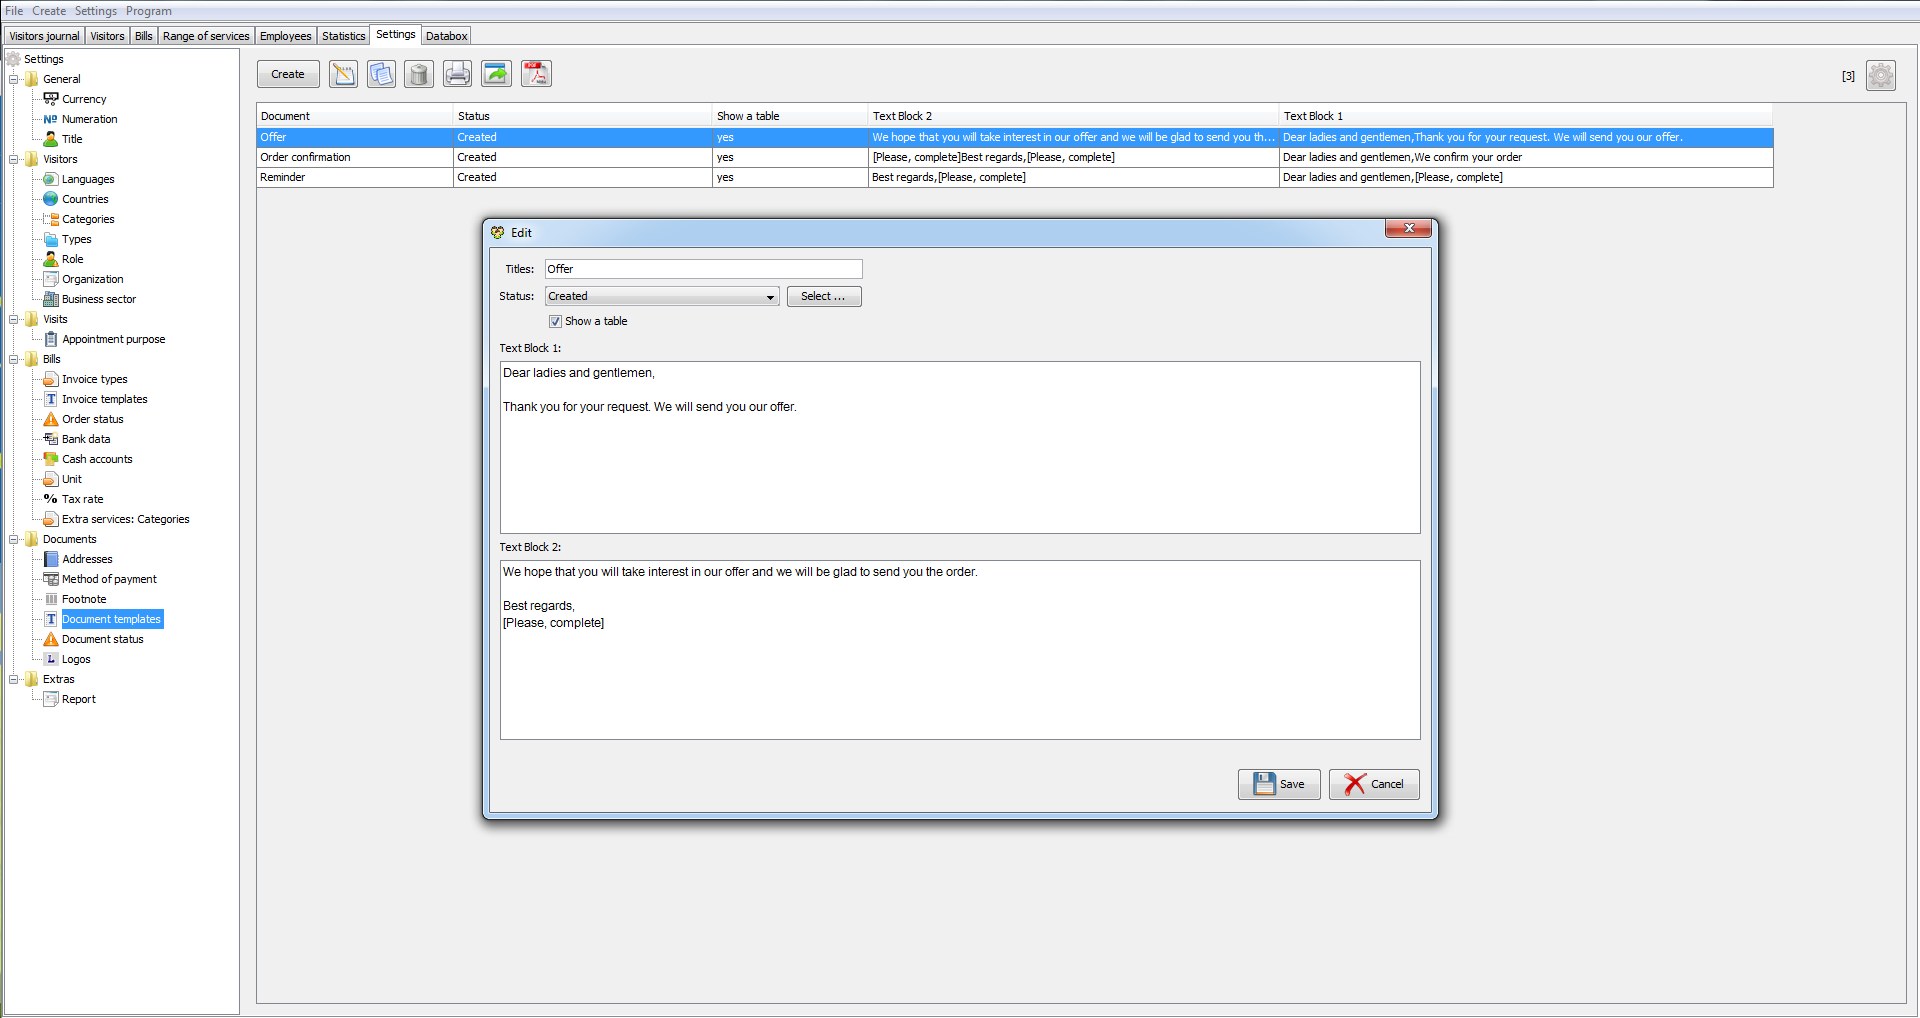 Visitor management 2.01.08 software screenshot